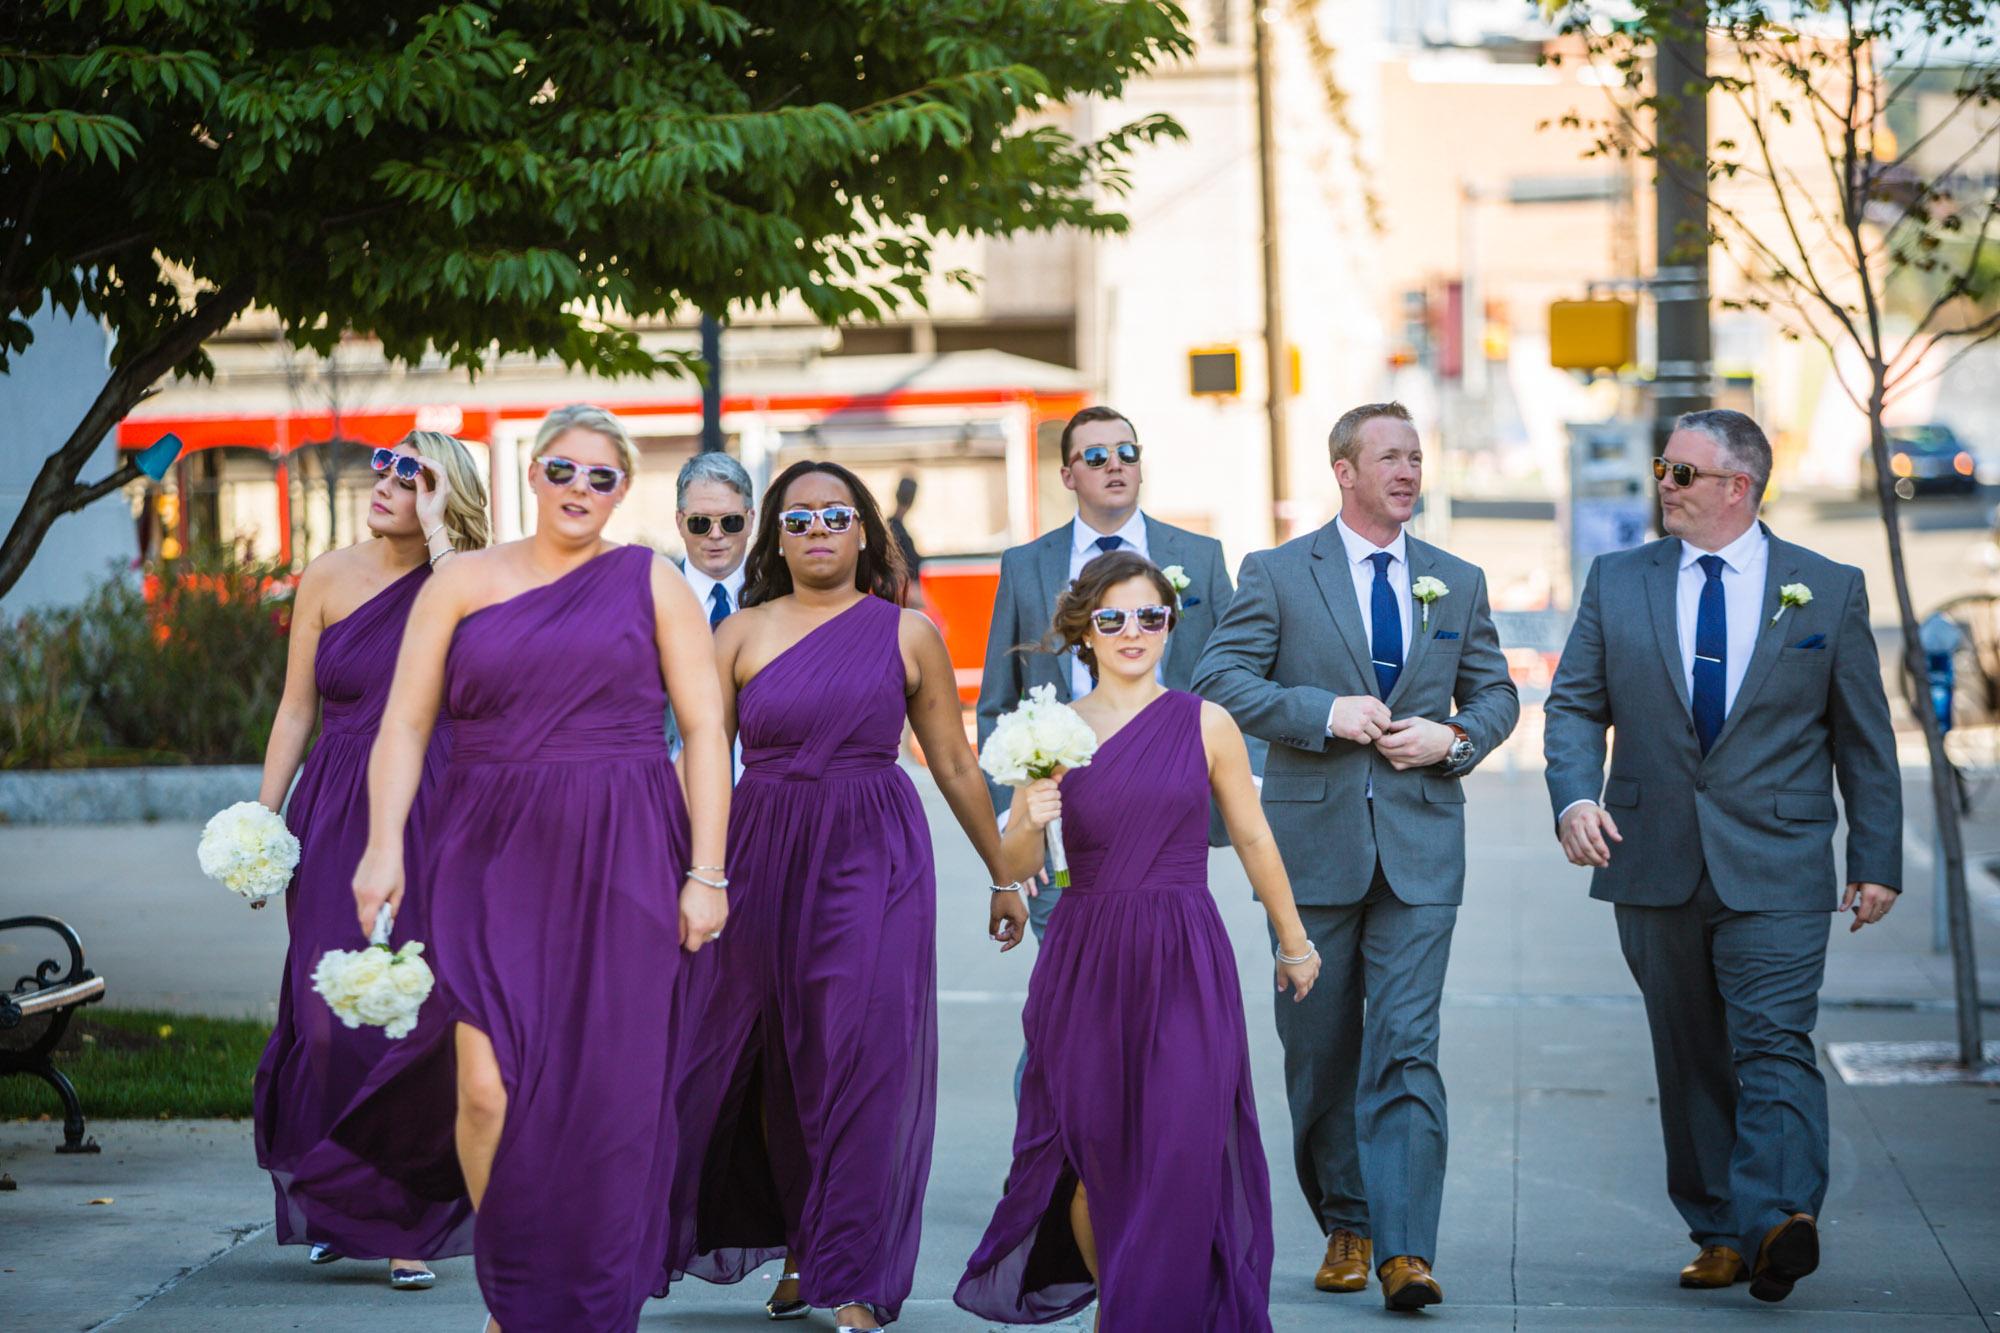 scranton_wedding_photographer_lettieri_pa (17 of 47).jpg